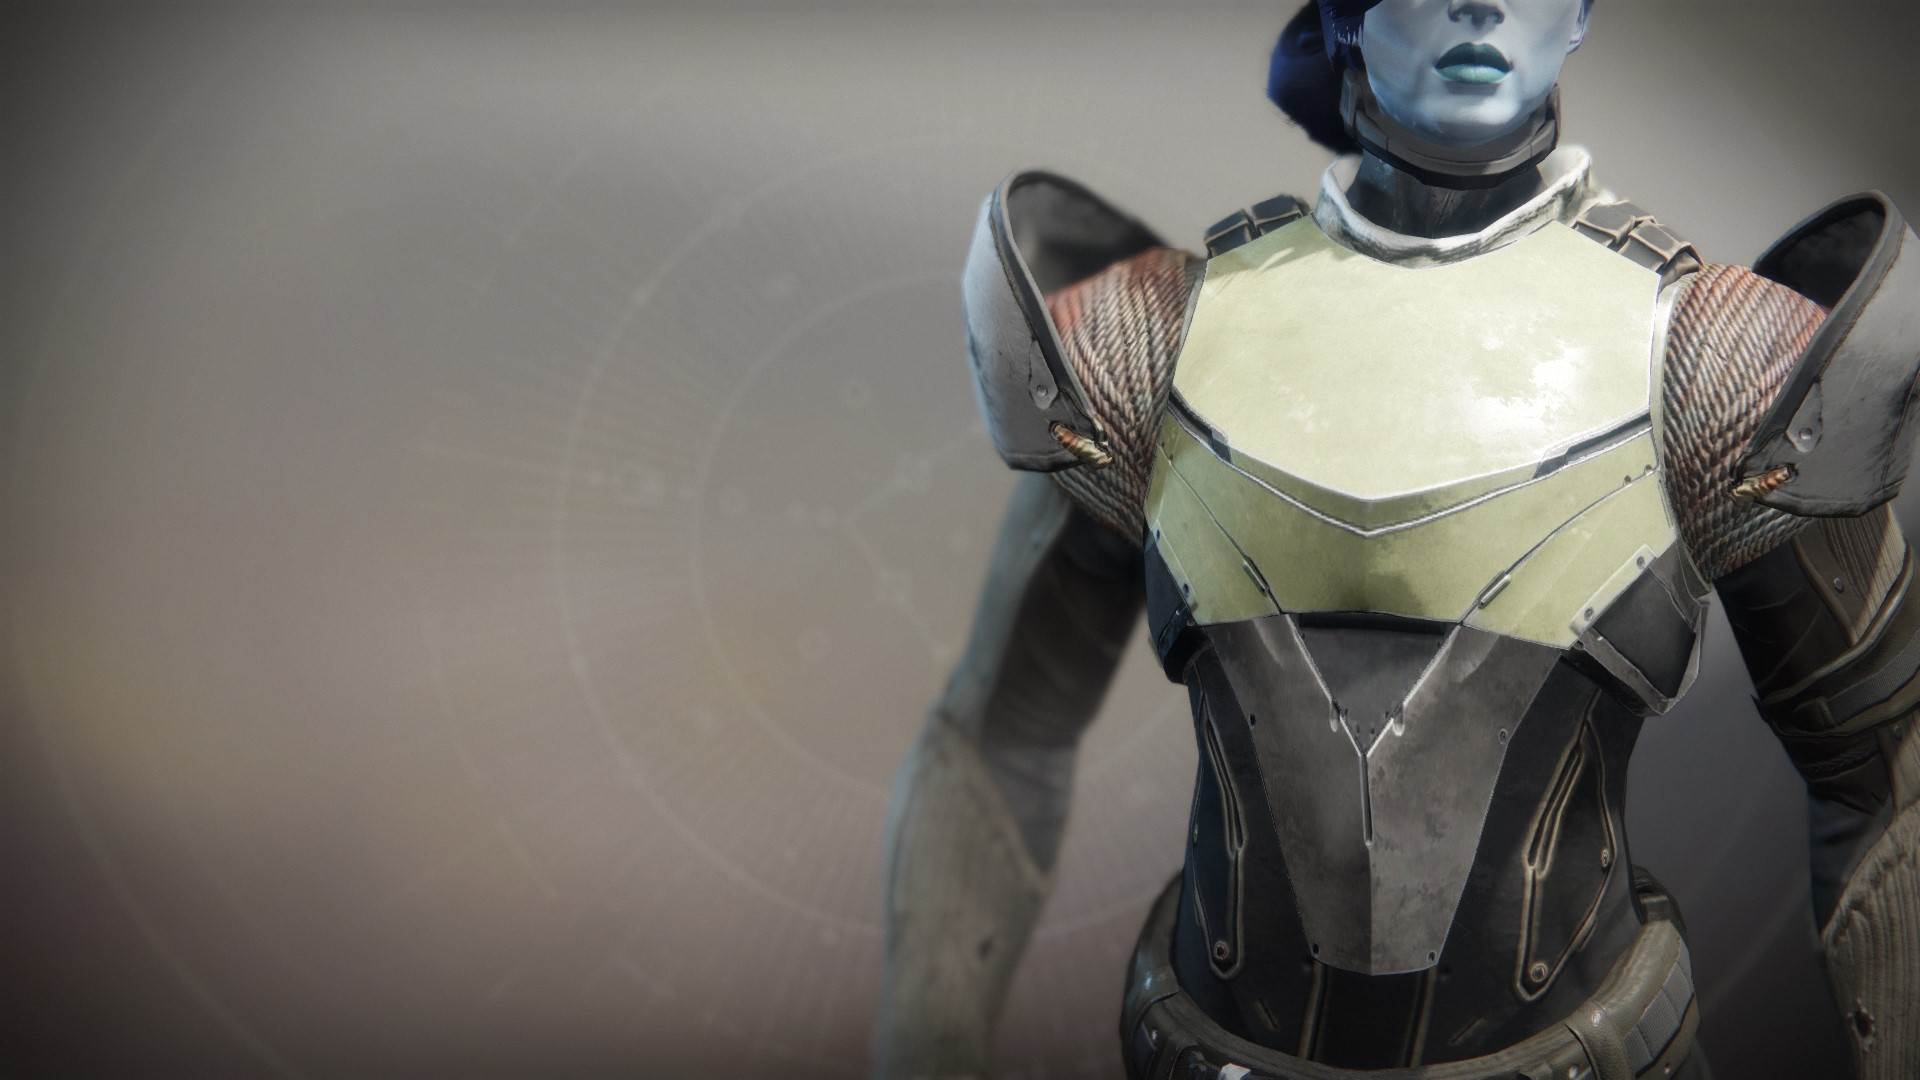 RPC Valiant - Destiny 2 Rare Chest Armor - Possible Rolls